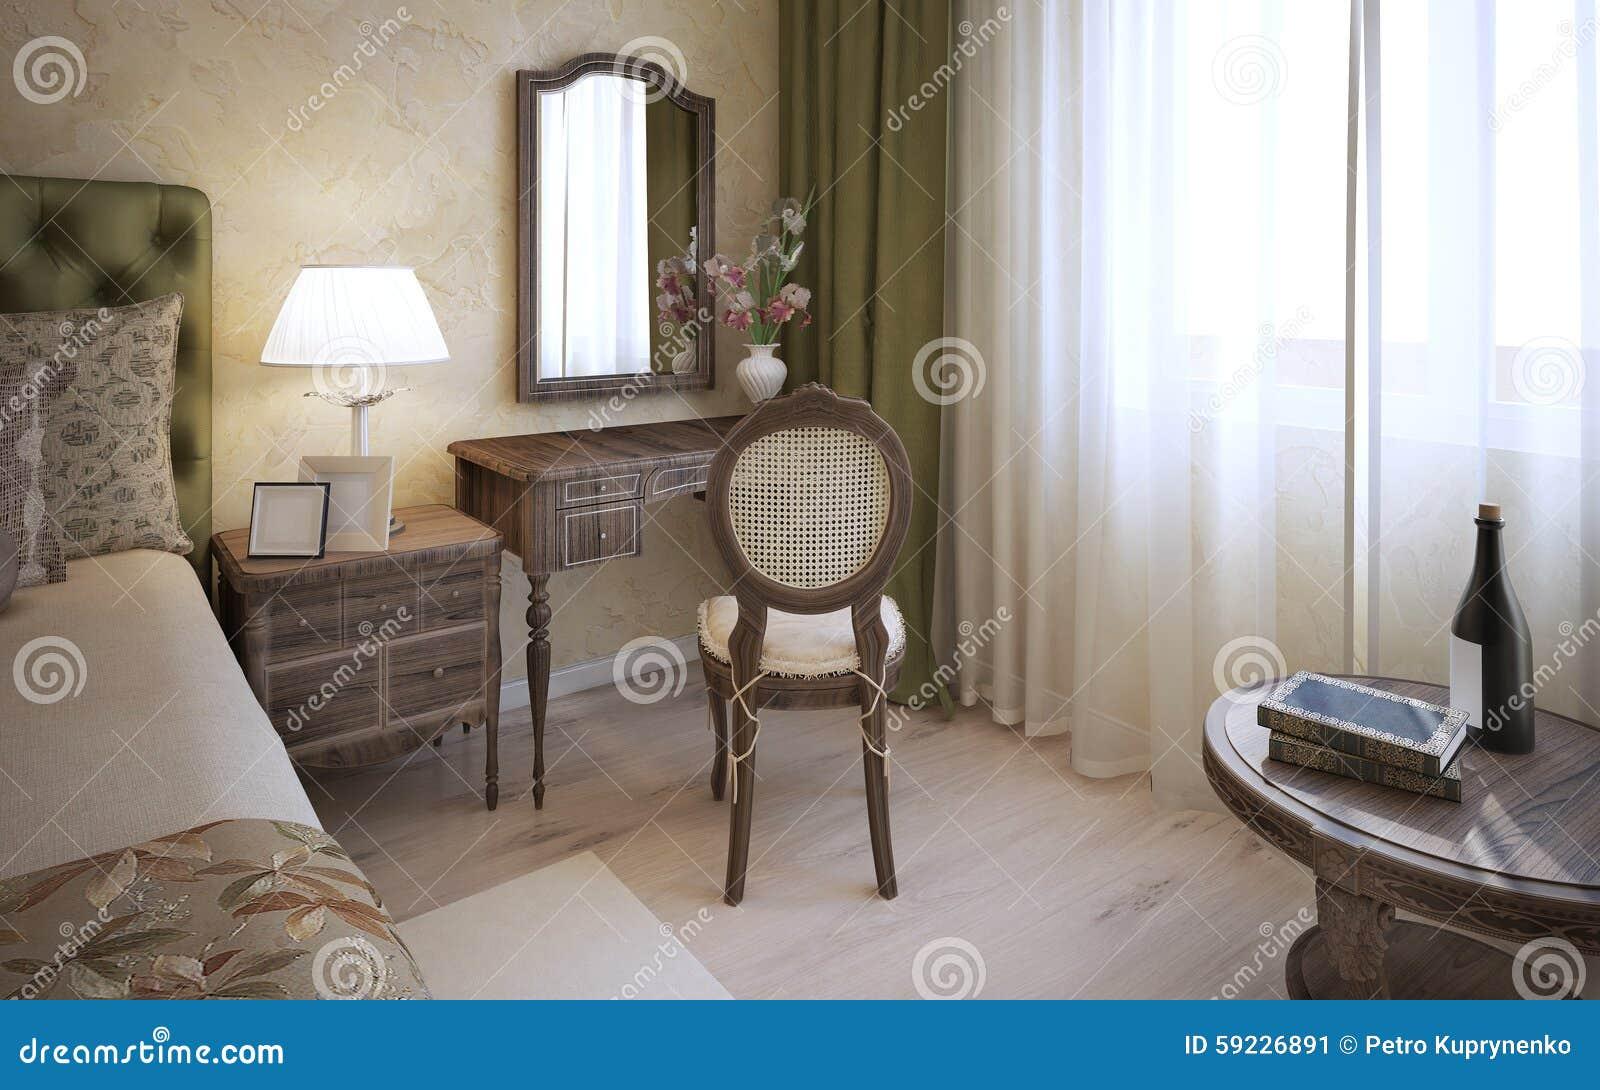 Dressingtabell i engelskt sovrum stock illustrationer   bild: 59226891